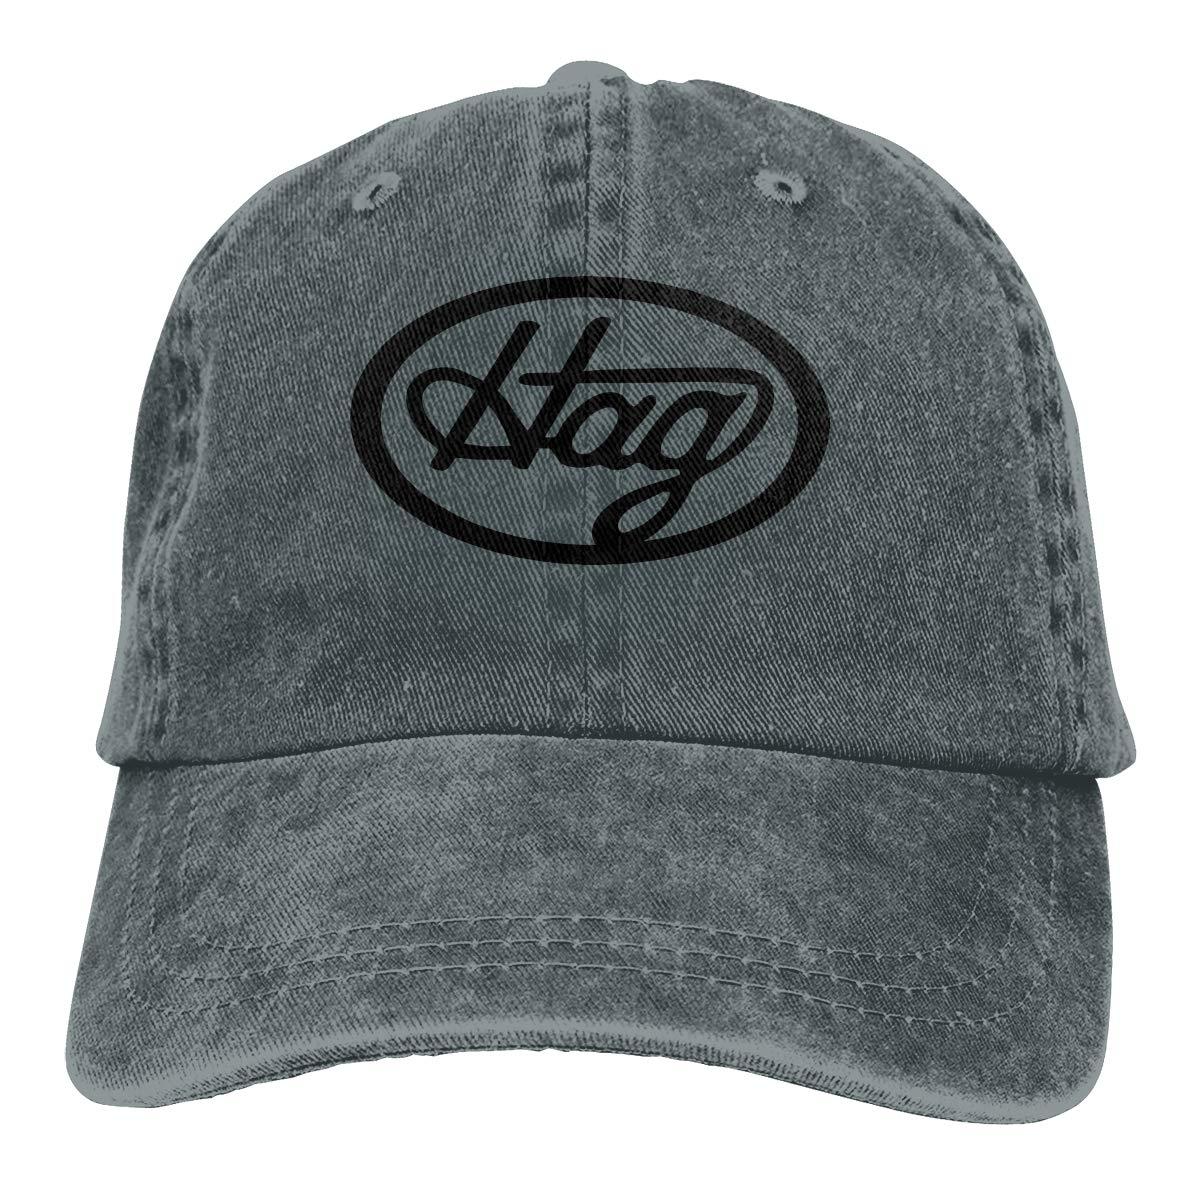 DIY Merle Haggard Custom Fashion Baseball Hatblack